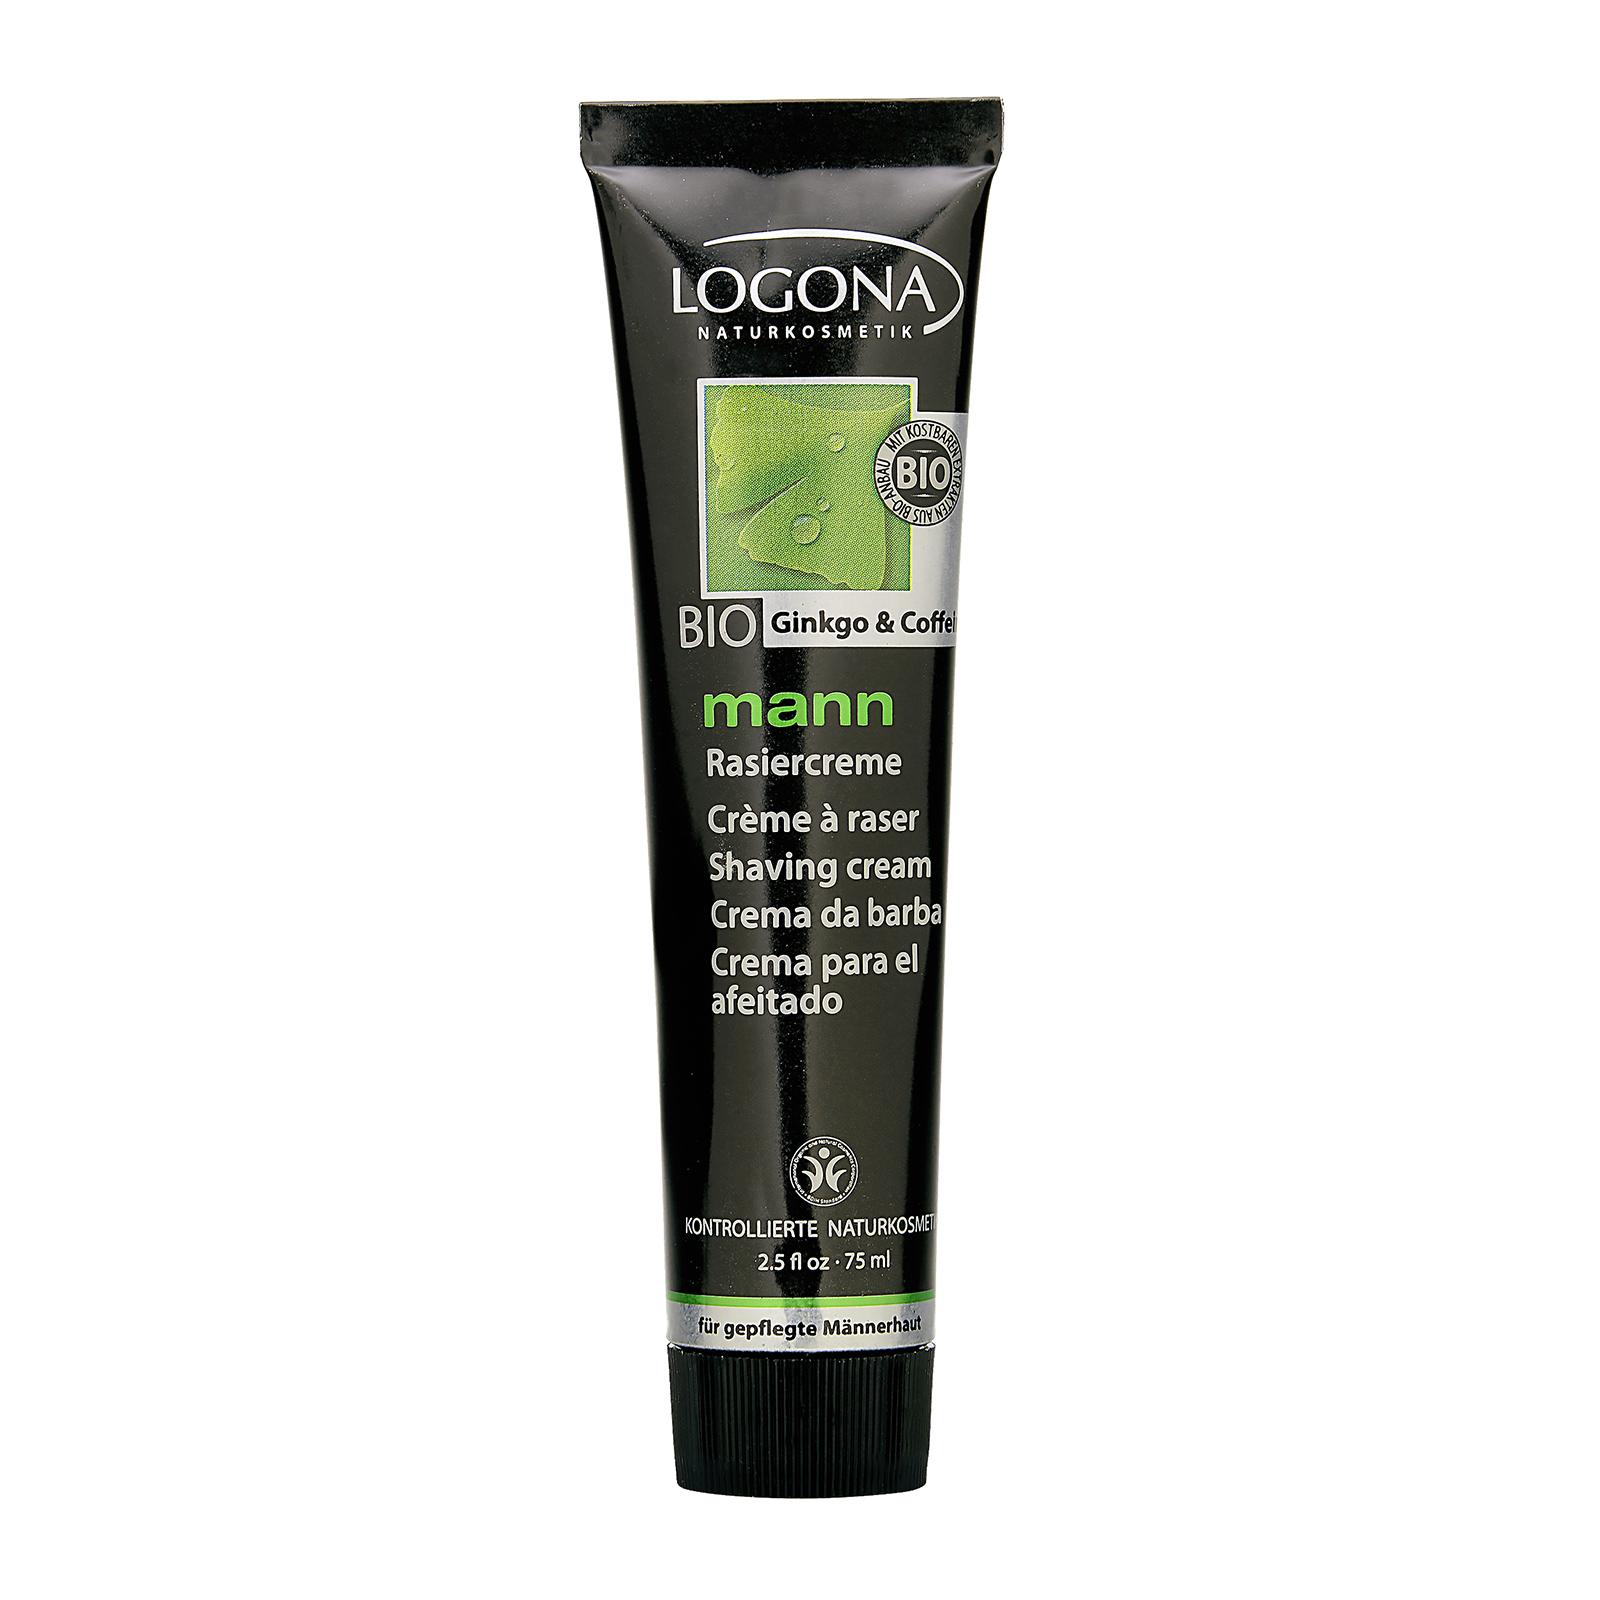 LOGONA Bio Ginkgo & Caffeine Man Shaving Cream 2.5oz, 75ml LGX0100155-000-00